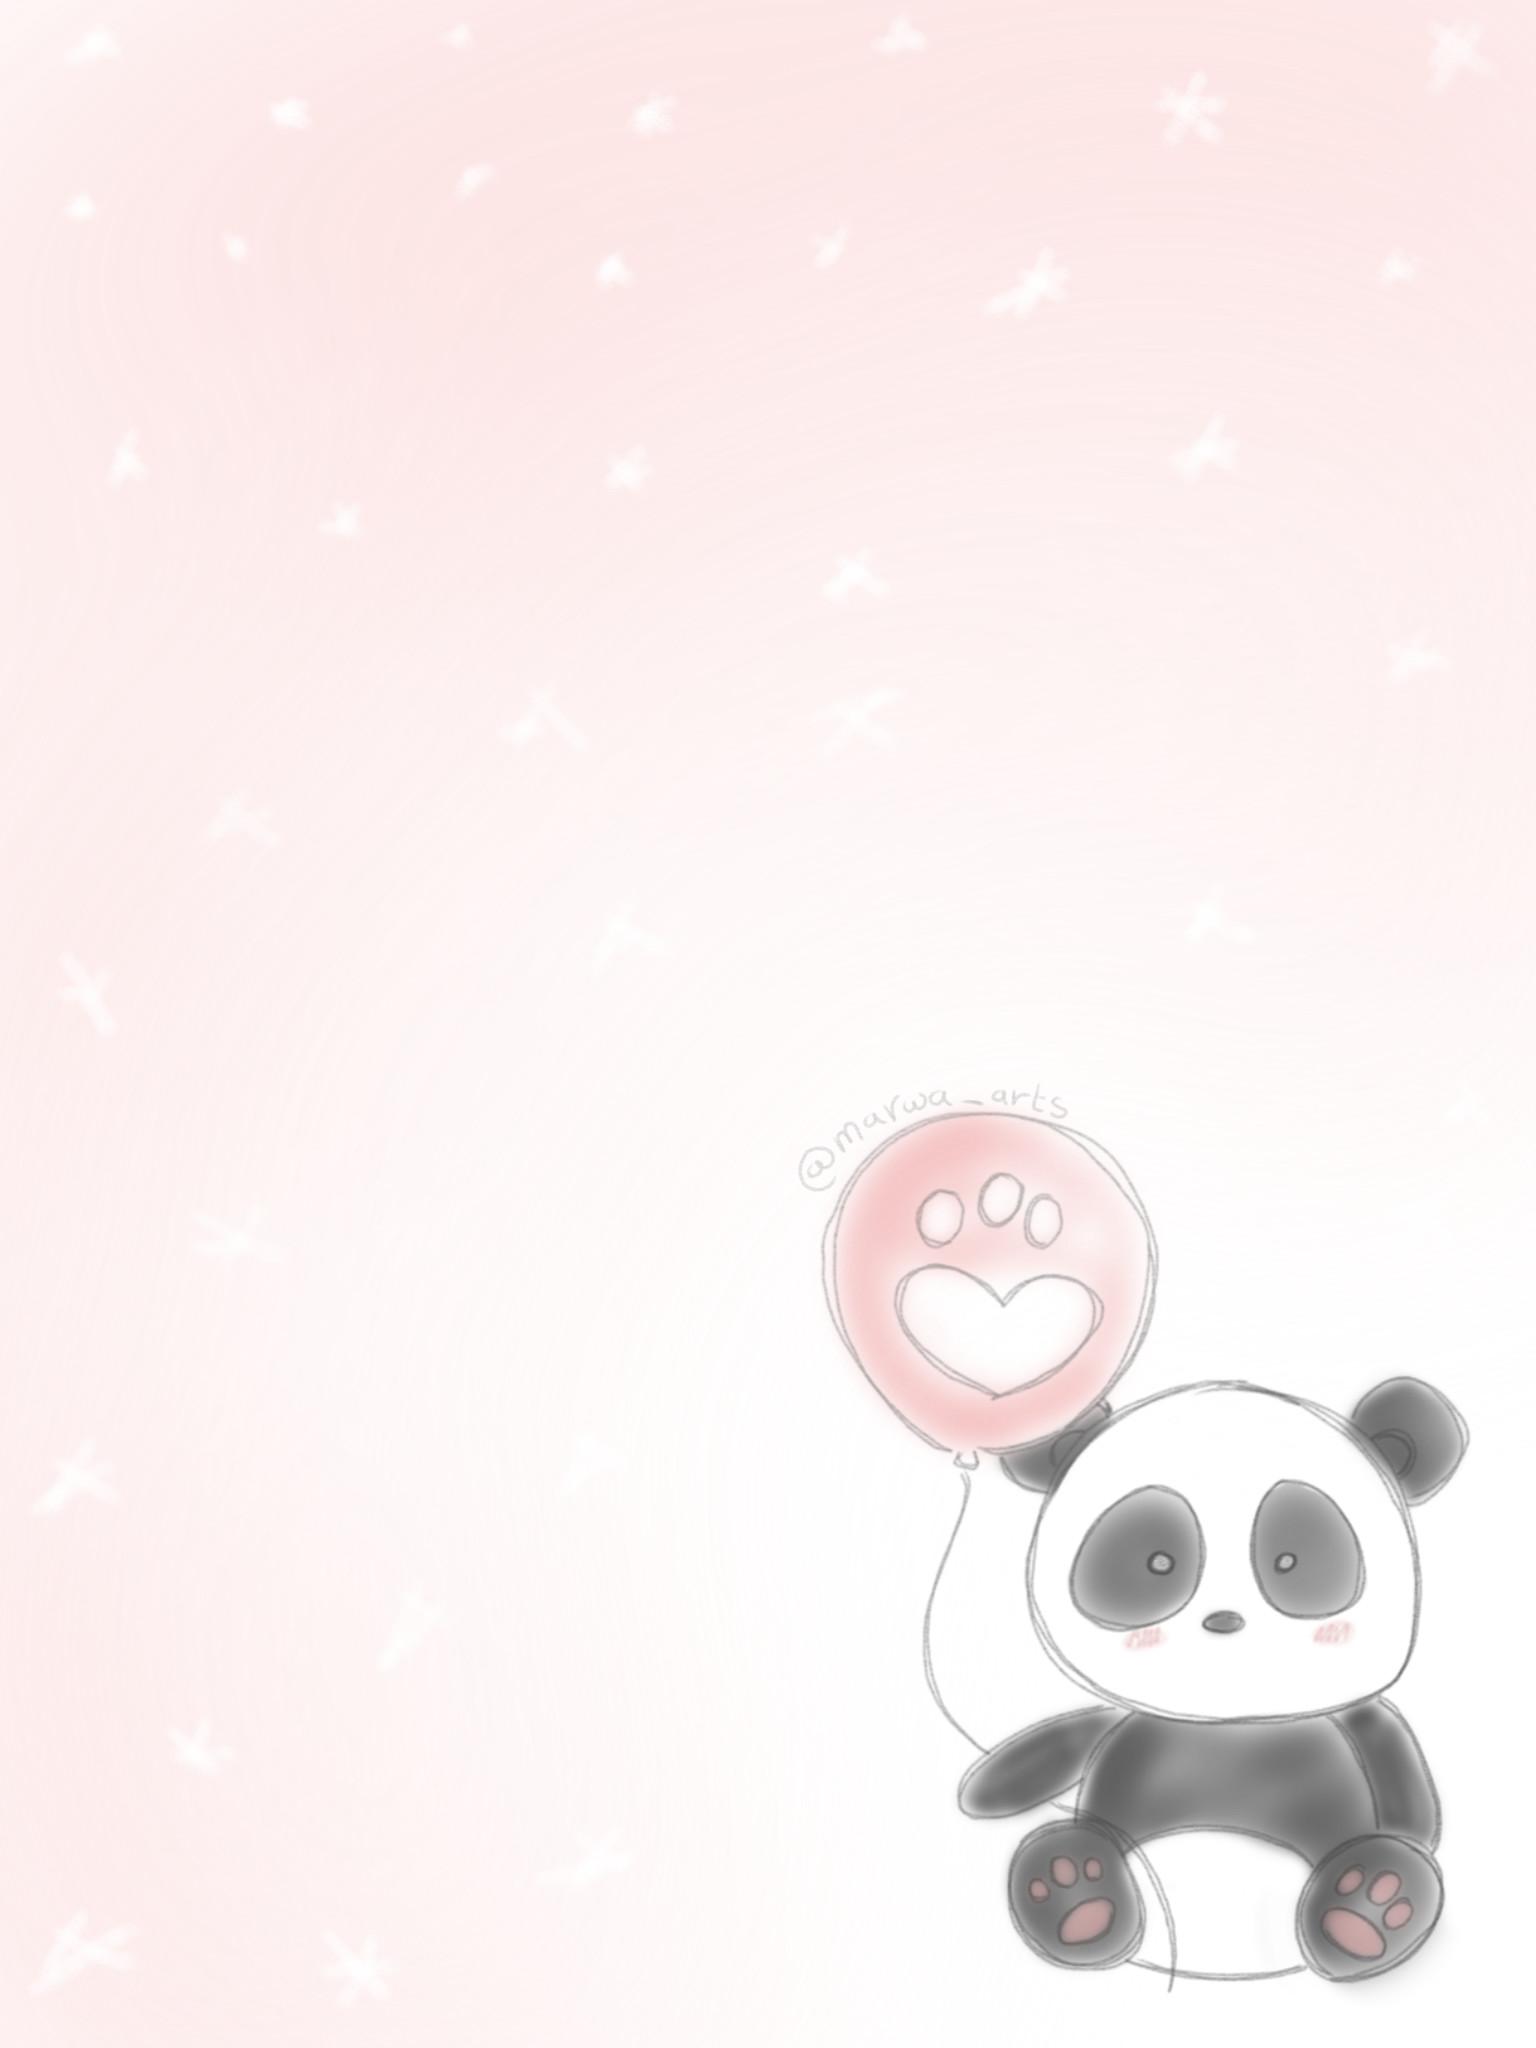 Rose Gold Panda Anime Wallpaper Cute Panda